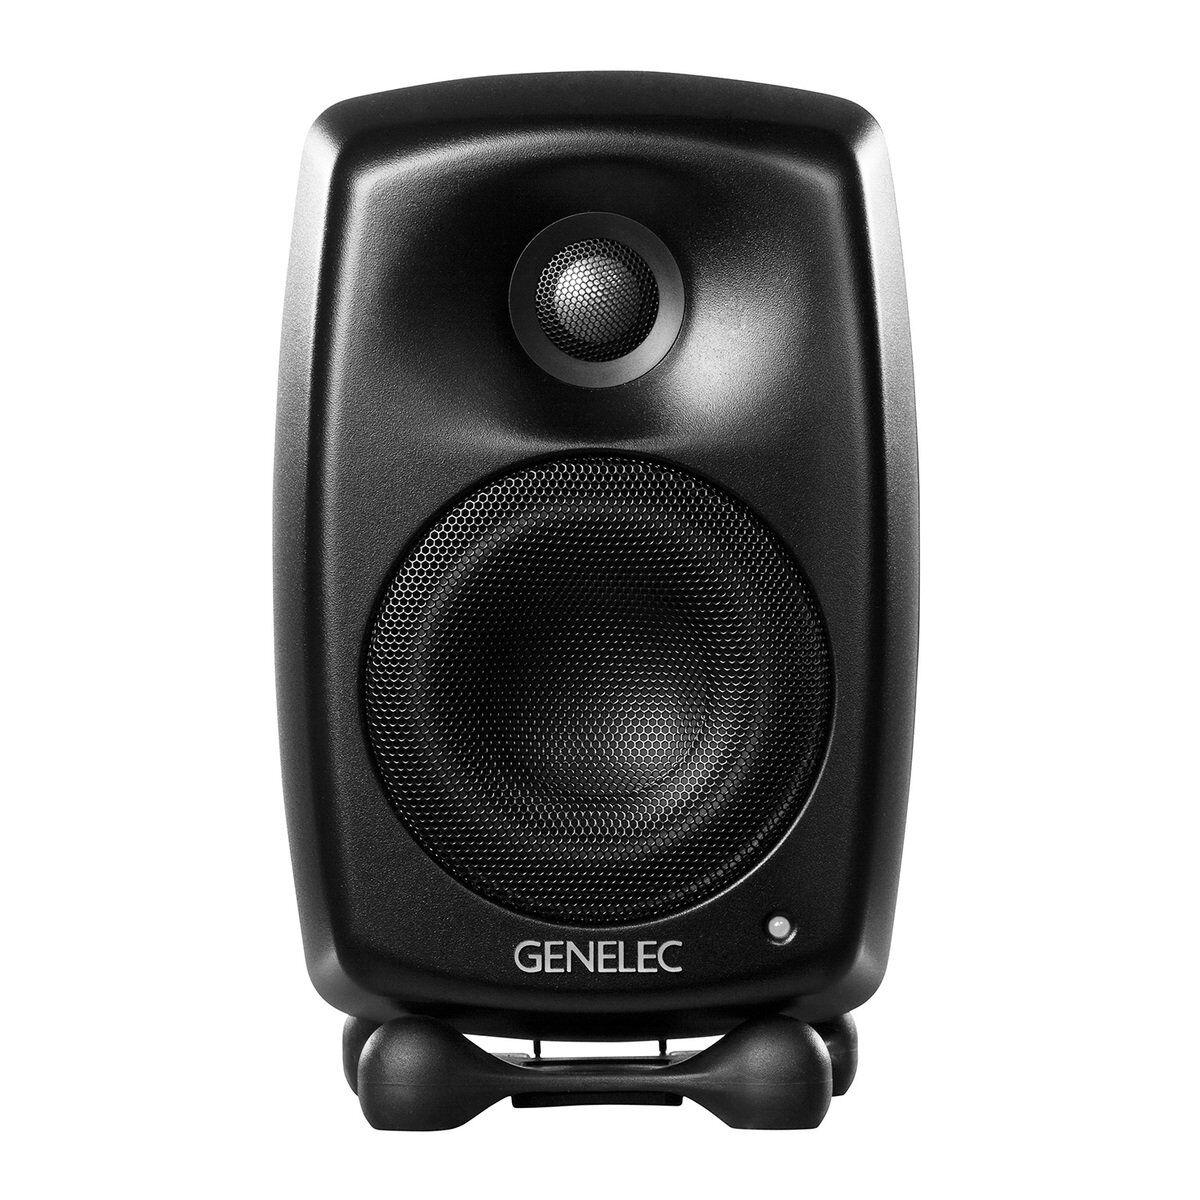 Genelec G Two (B) active speaker, black